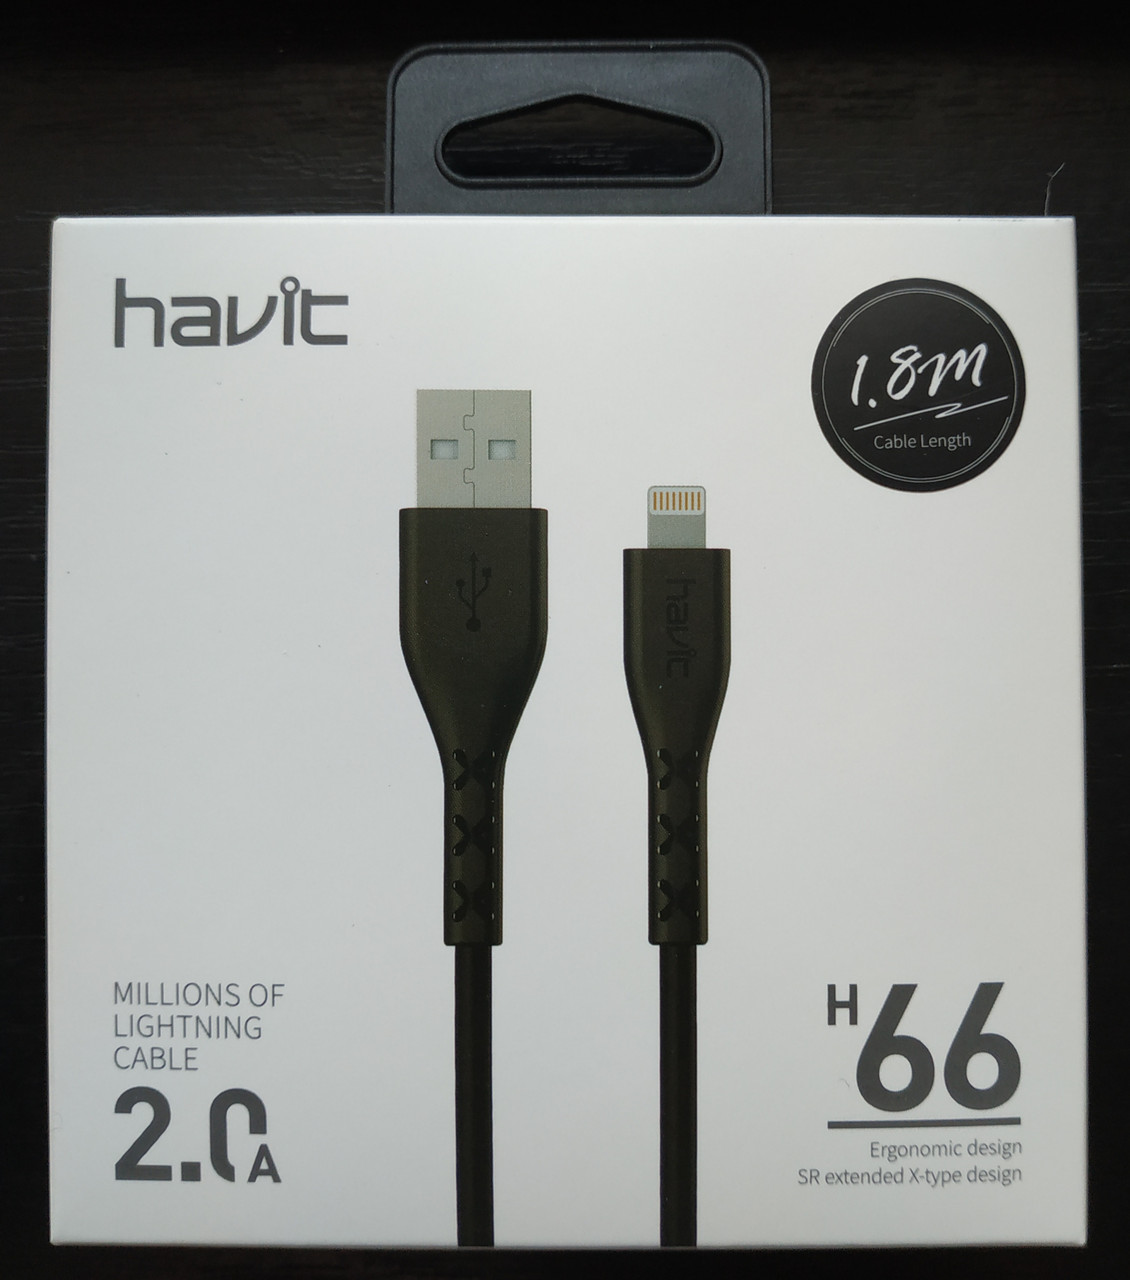 Кабель для передачи данных смартфона Havit HV-H66 Lighting, black, 1.8m